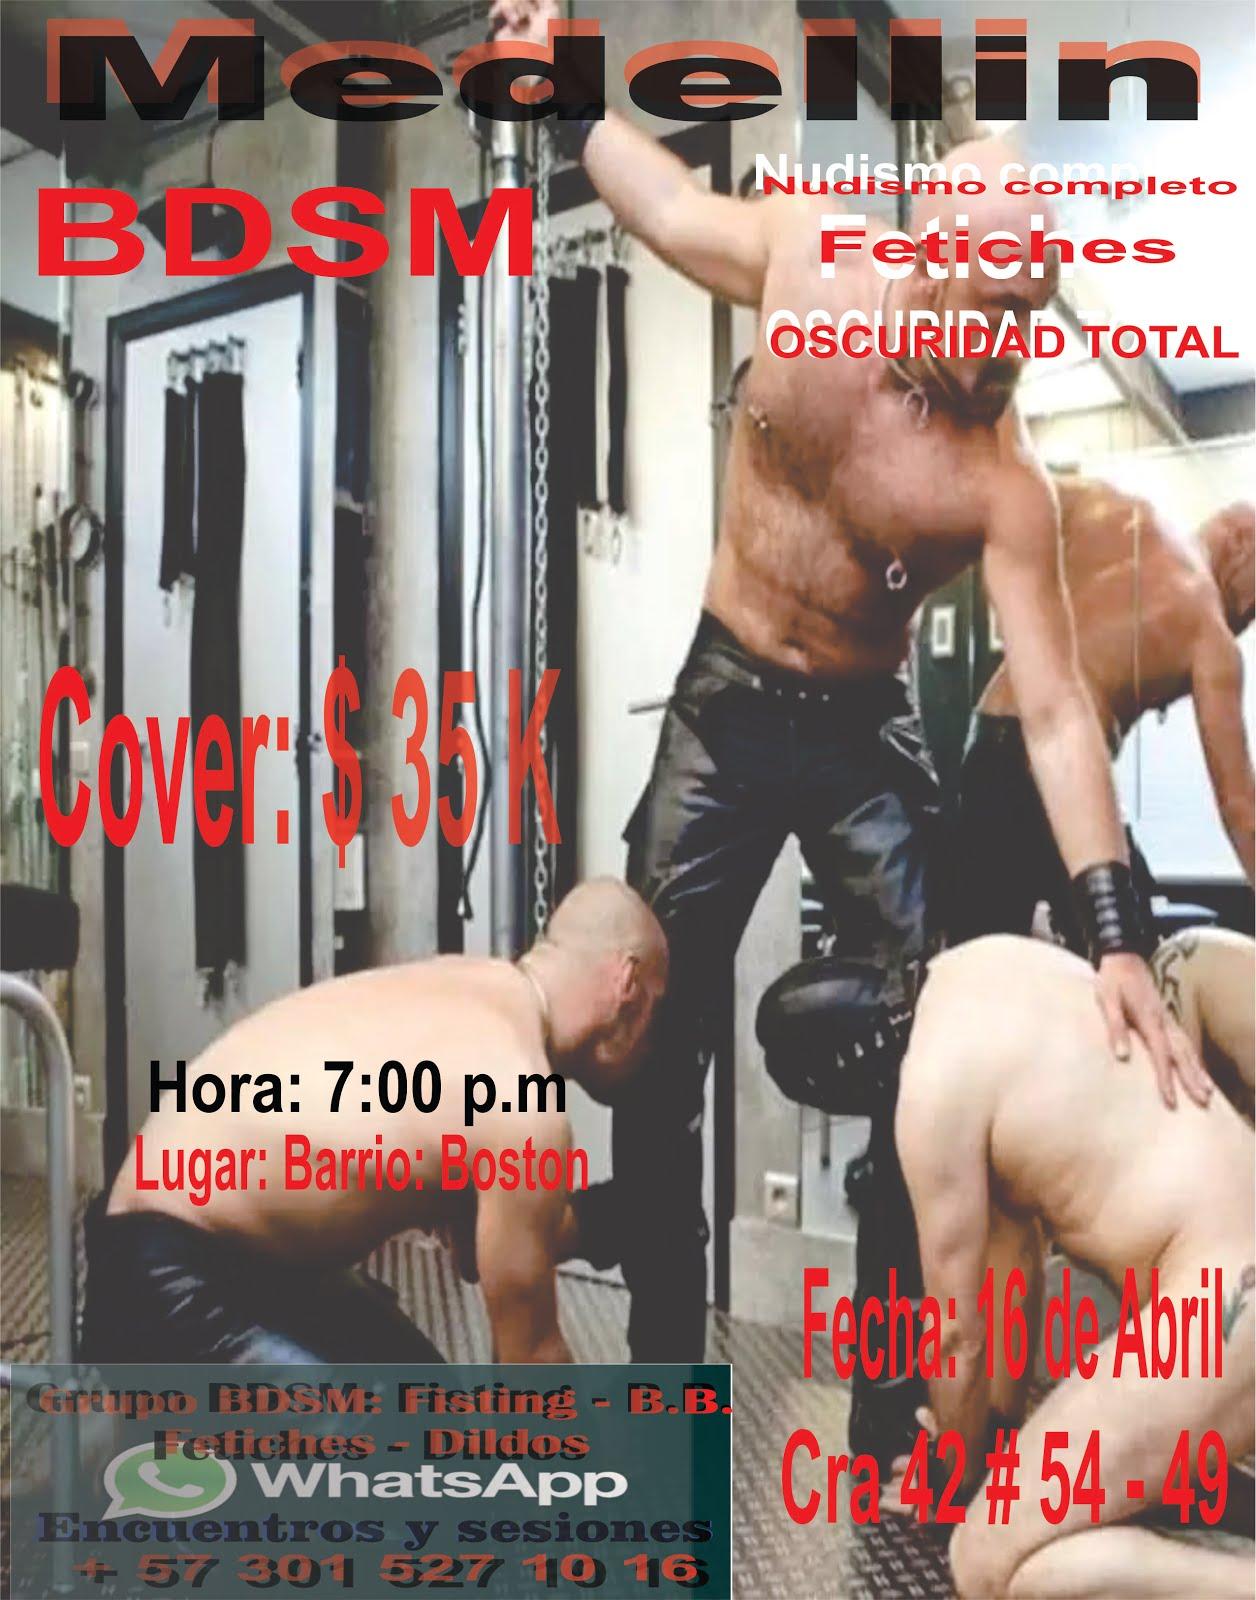 Medellin !!!! Sin censura !!!